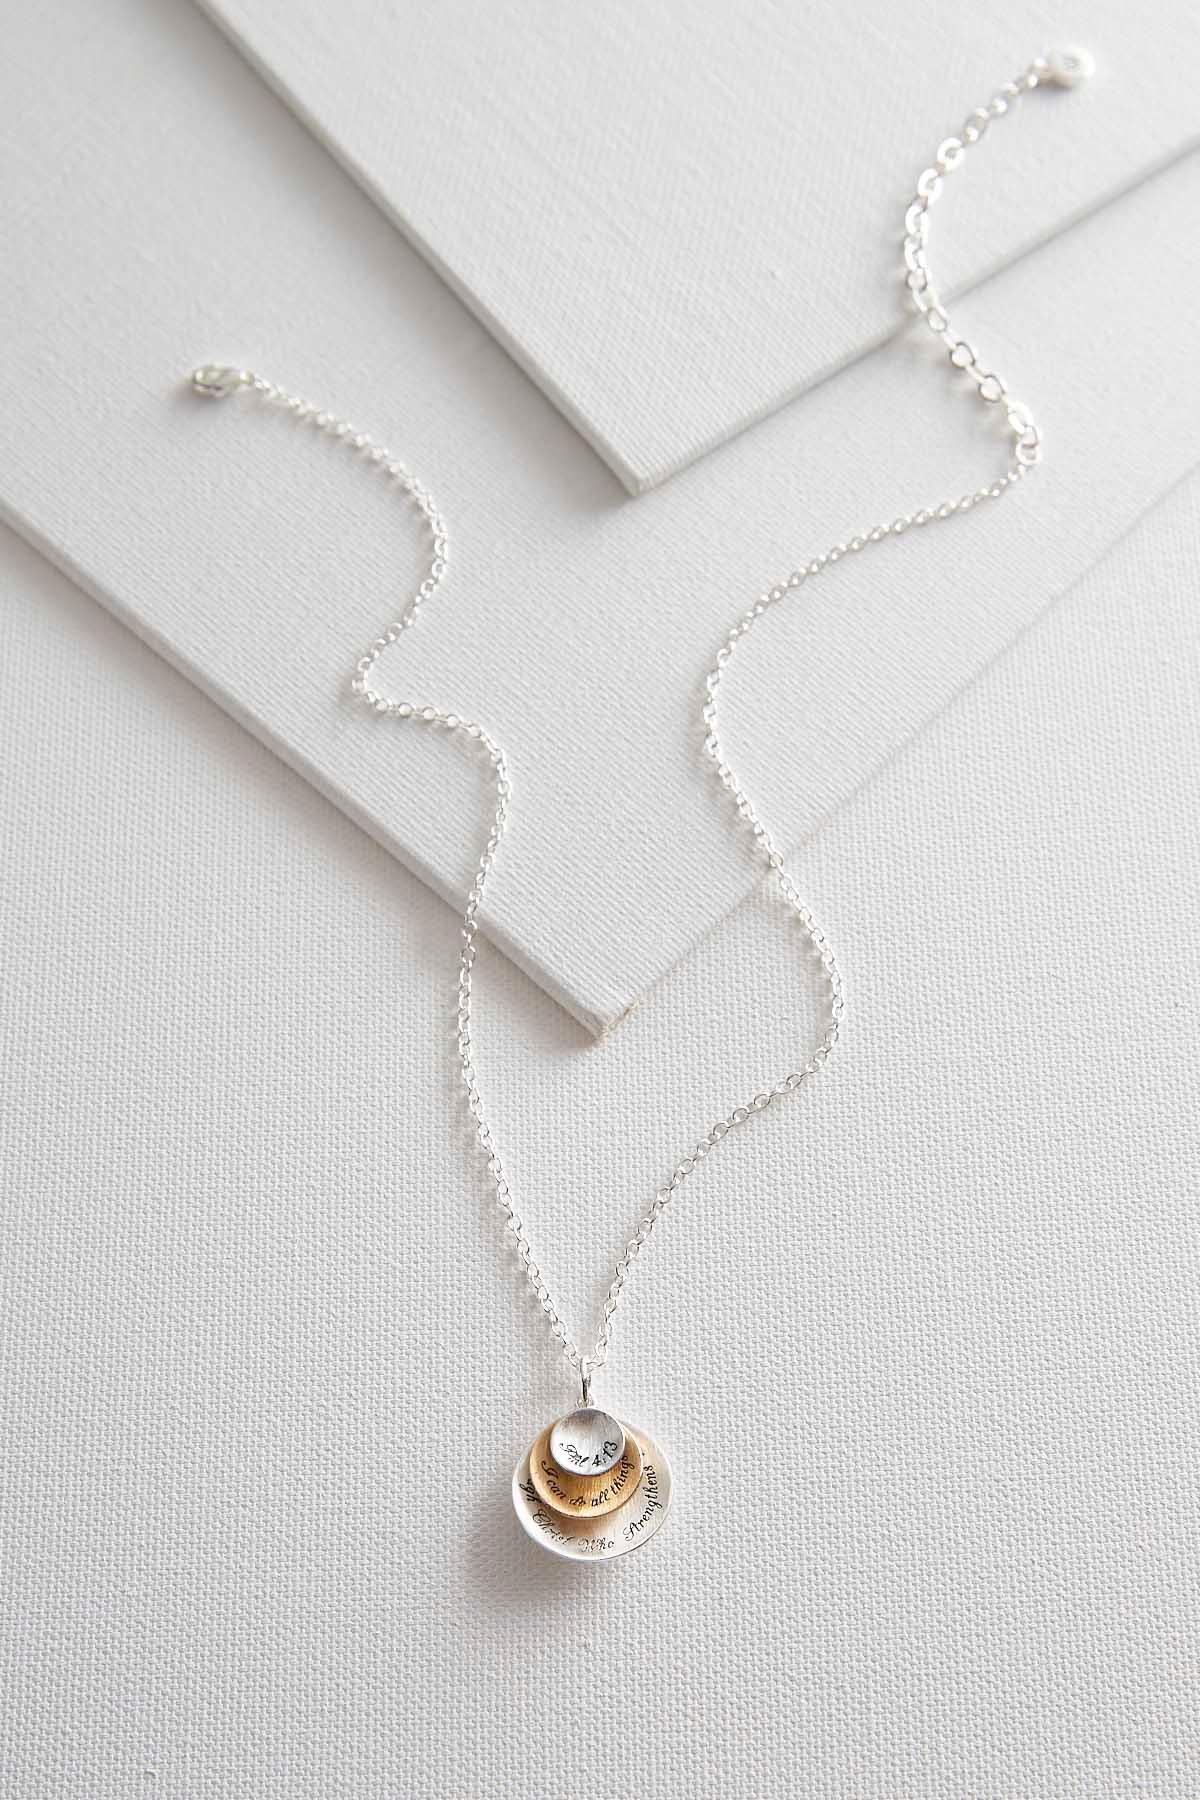 Versona two toned inspirational pendant necklace two toned inspirational pendant necklace item 43456318 aloadofball Choice Image